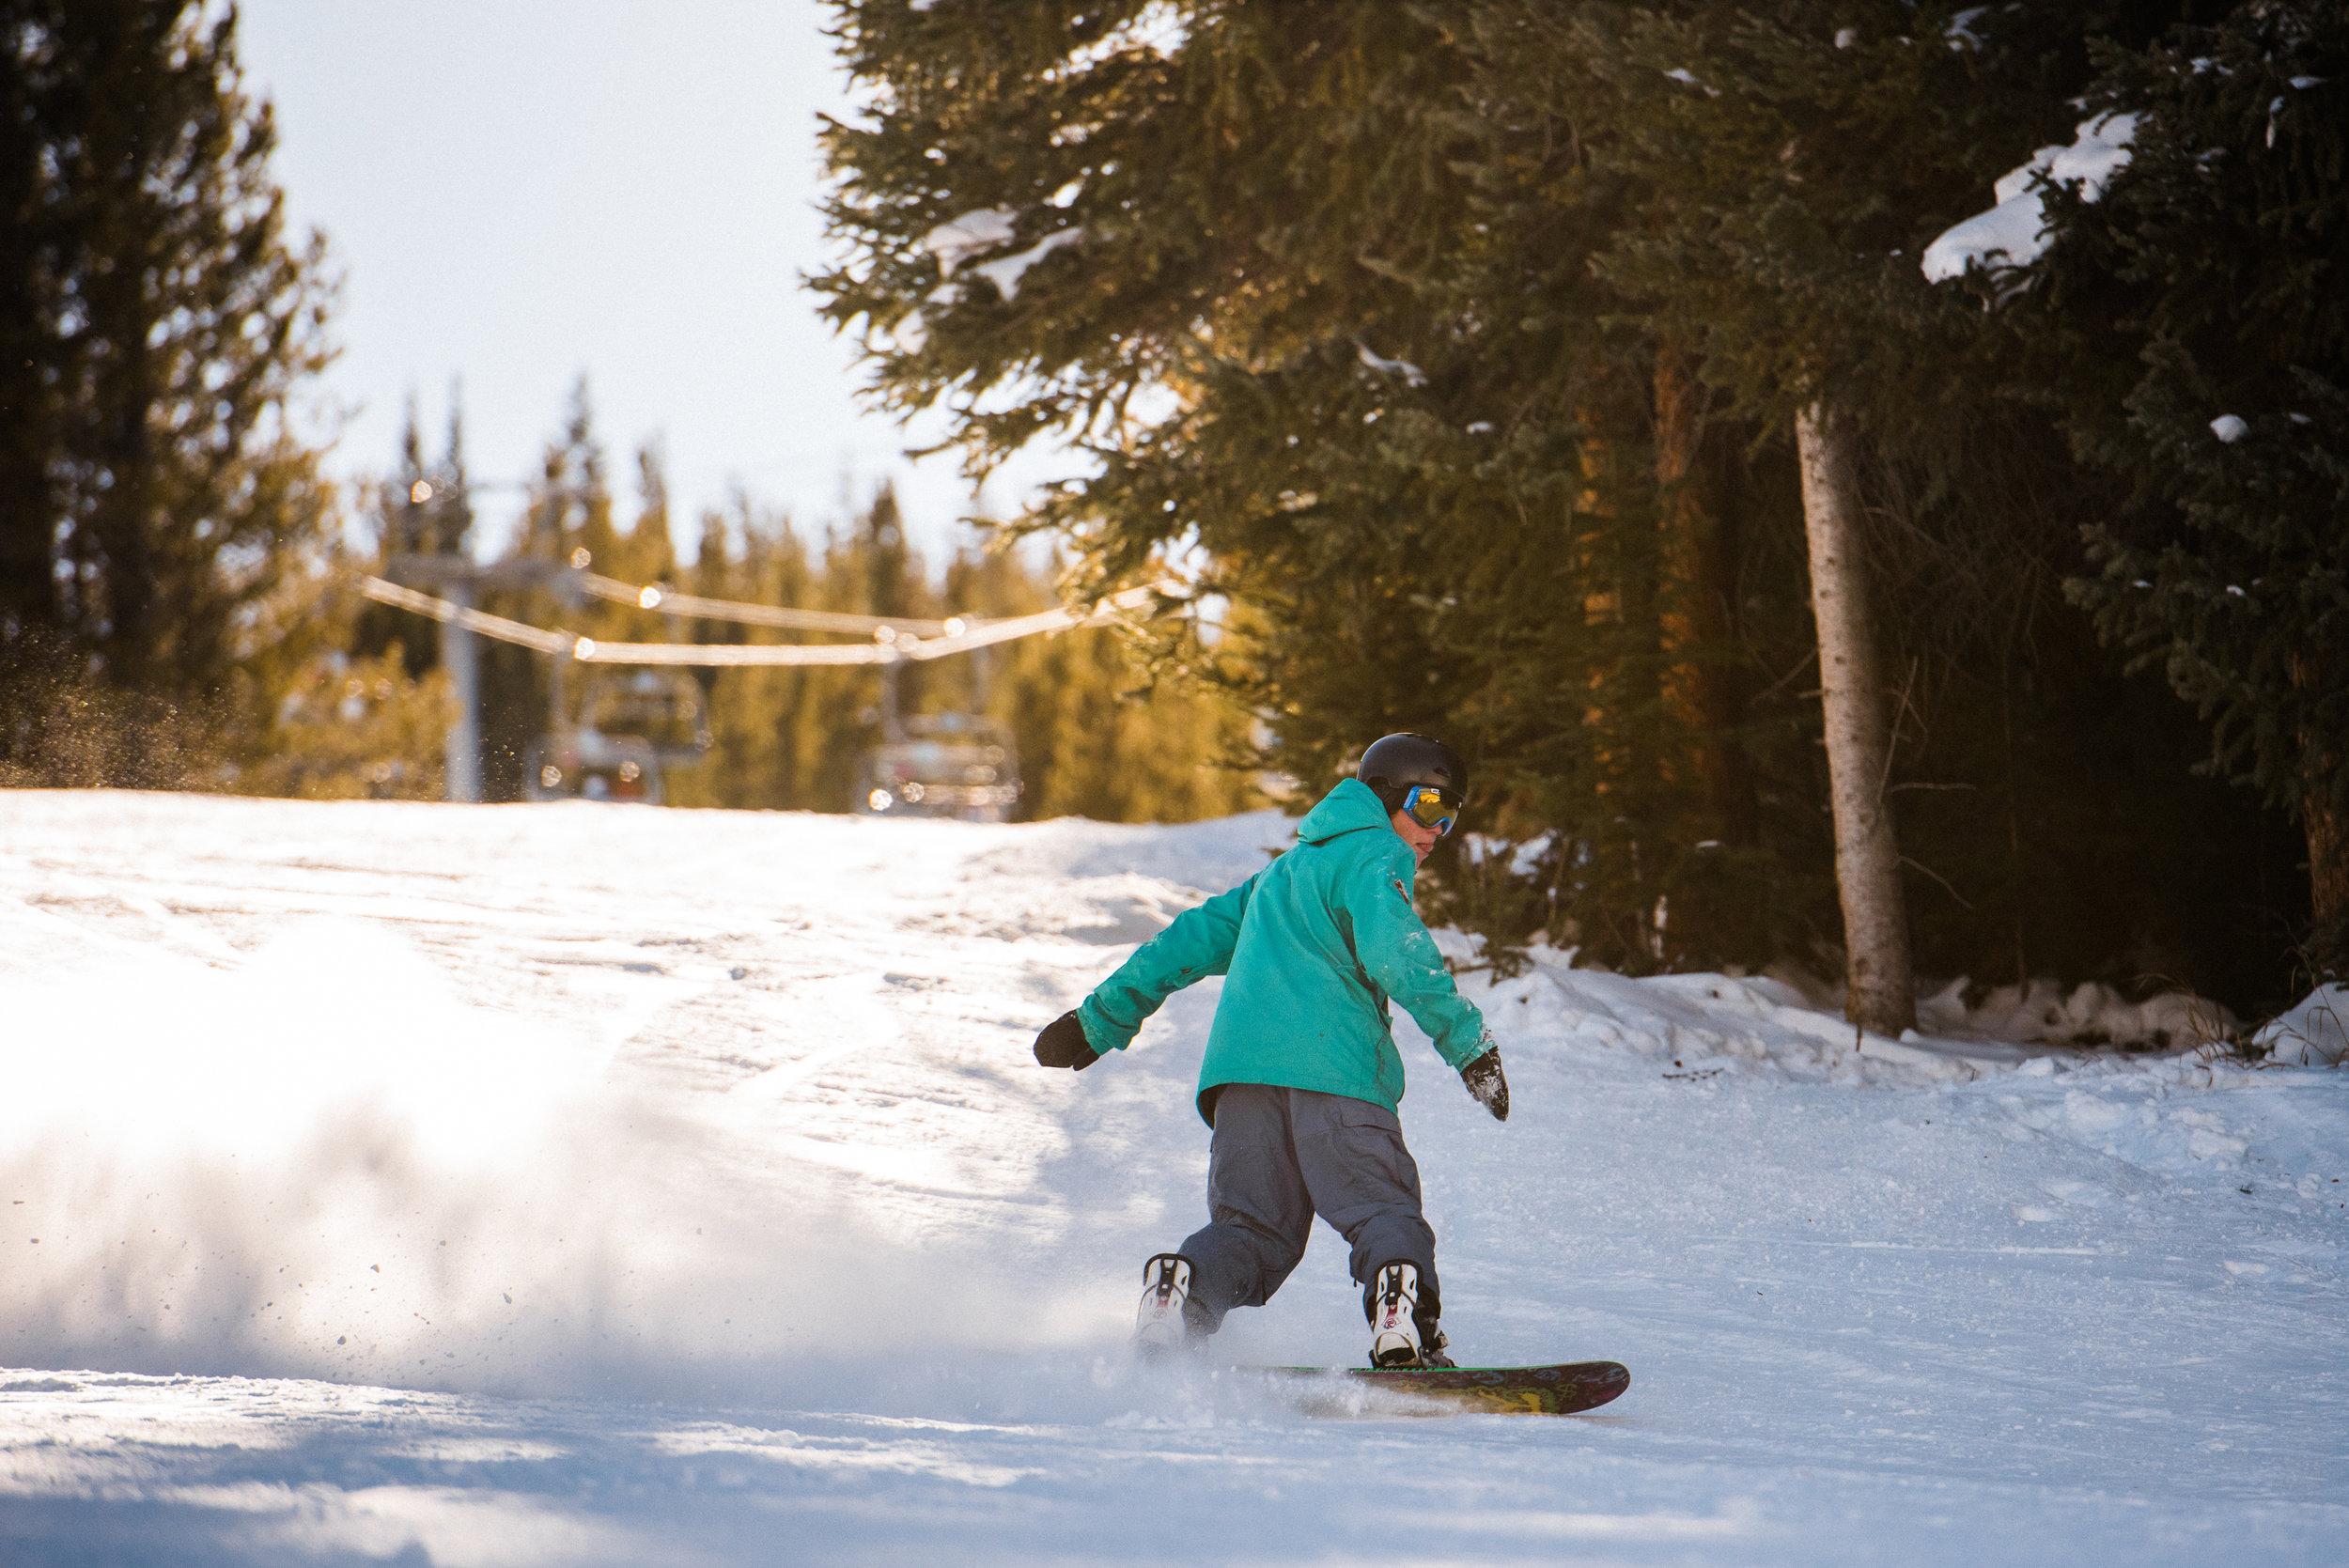 TaraShupe_Outdoor_Photographer_Loweprobags_Colorado_Copper_Mountains_Ski_44.jpg